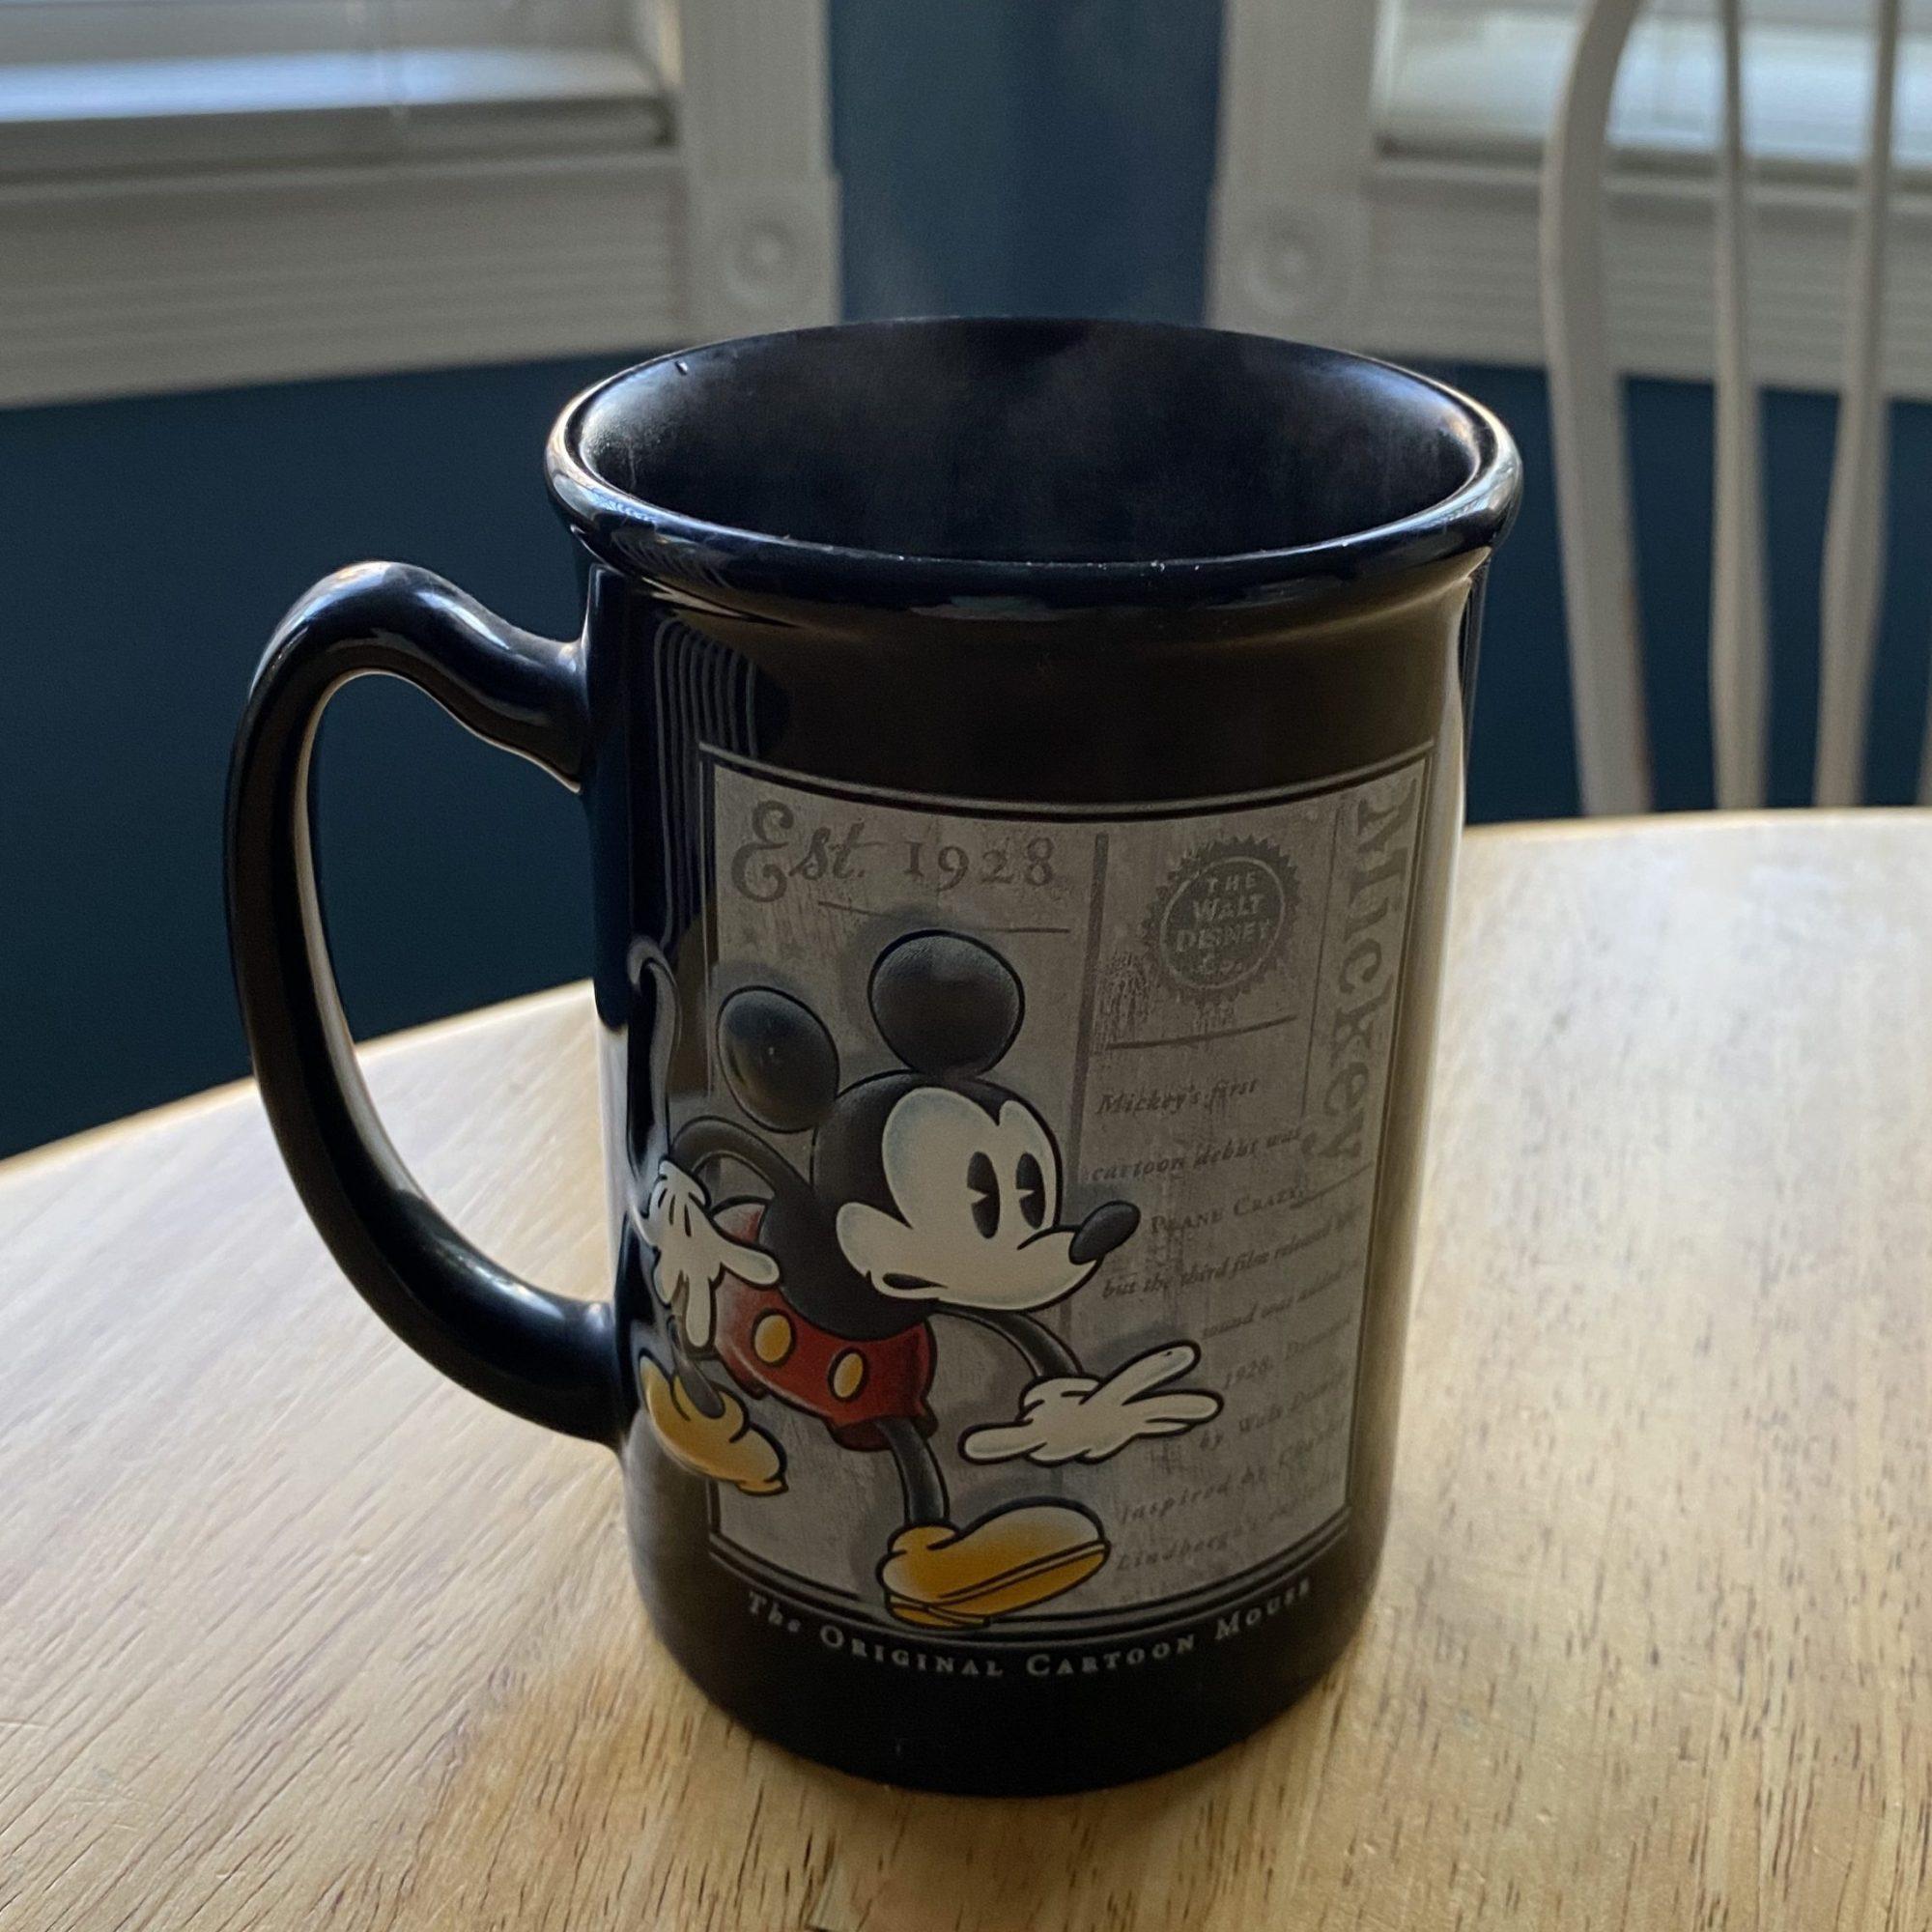 Mickey Mouse coffee mug #disneymugs denise m. colby post